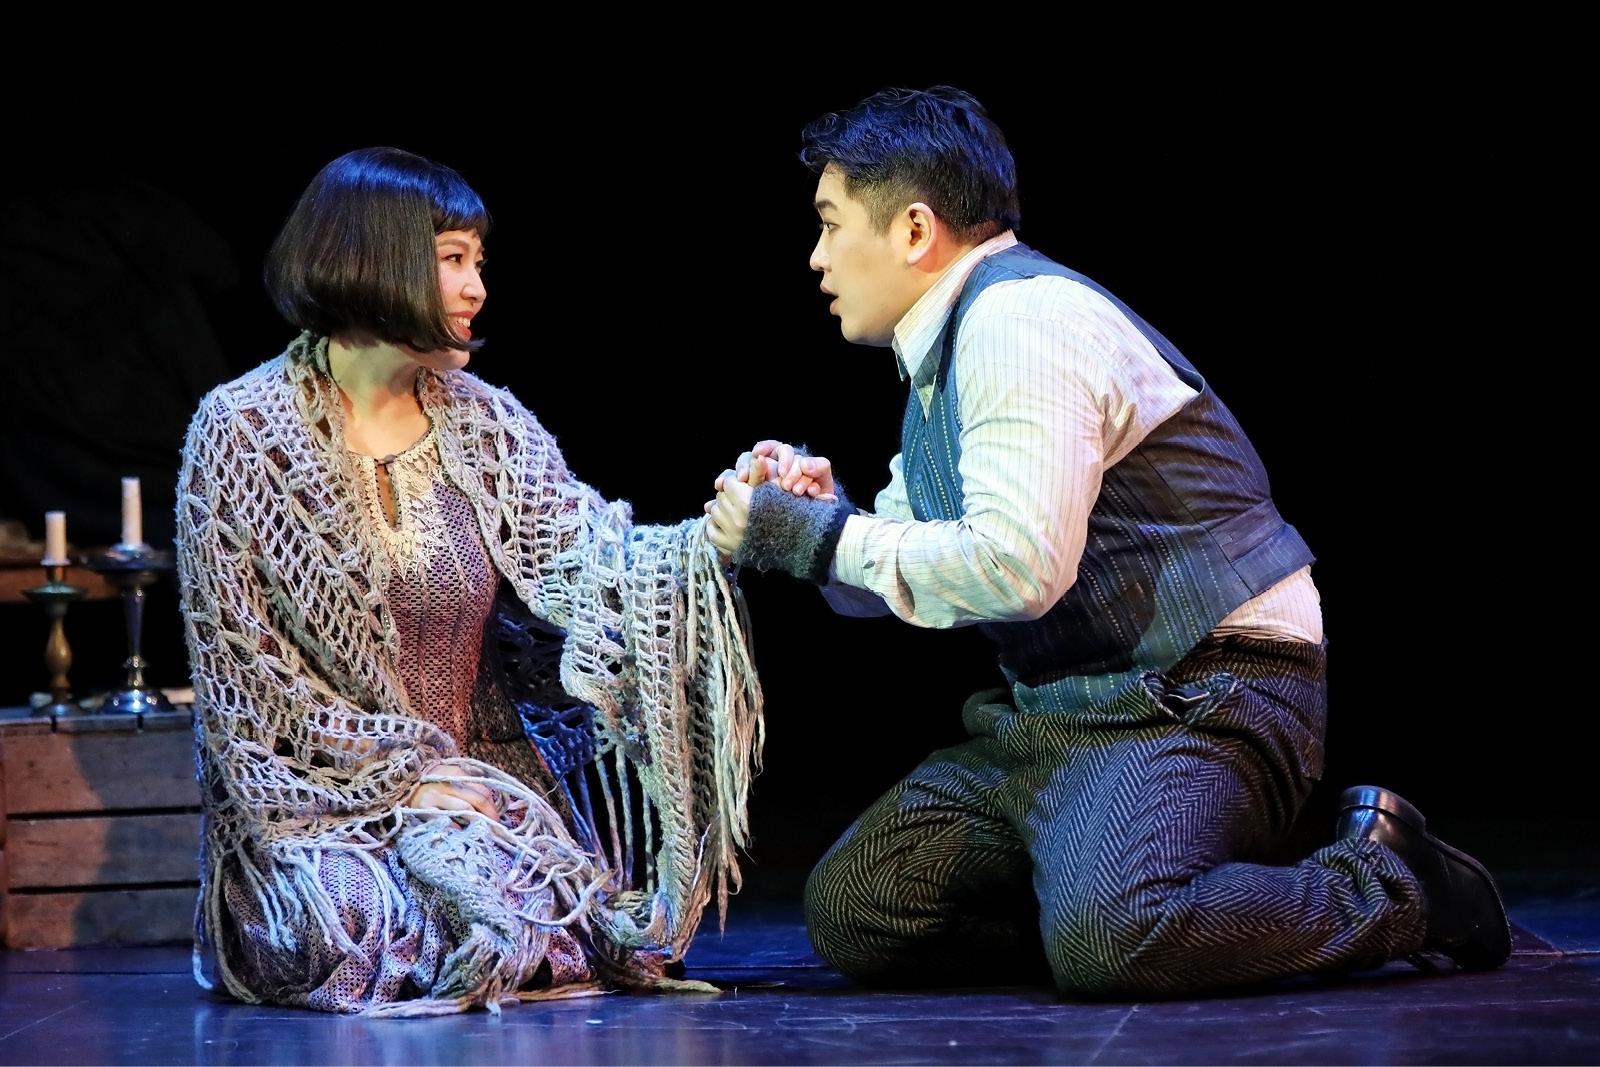 Karah Son and Kang Wang in Opera Australia's La Boheme